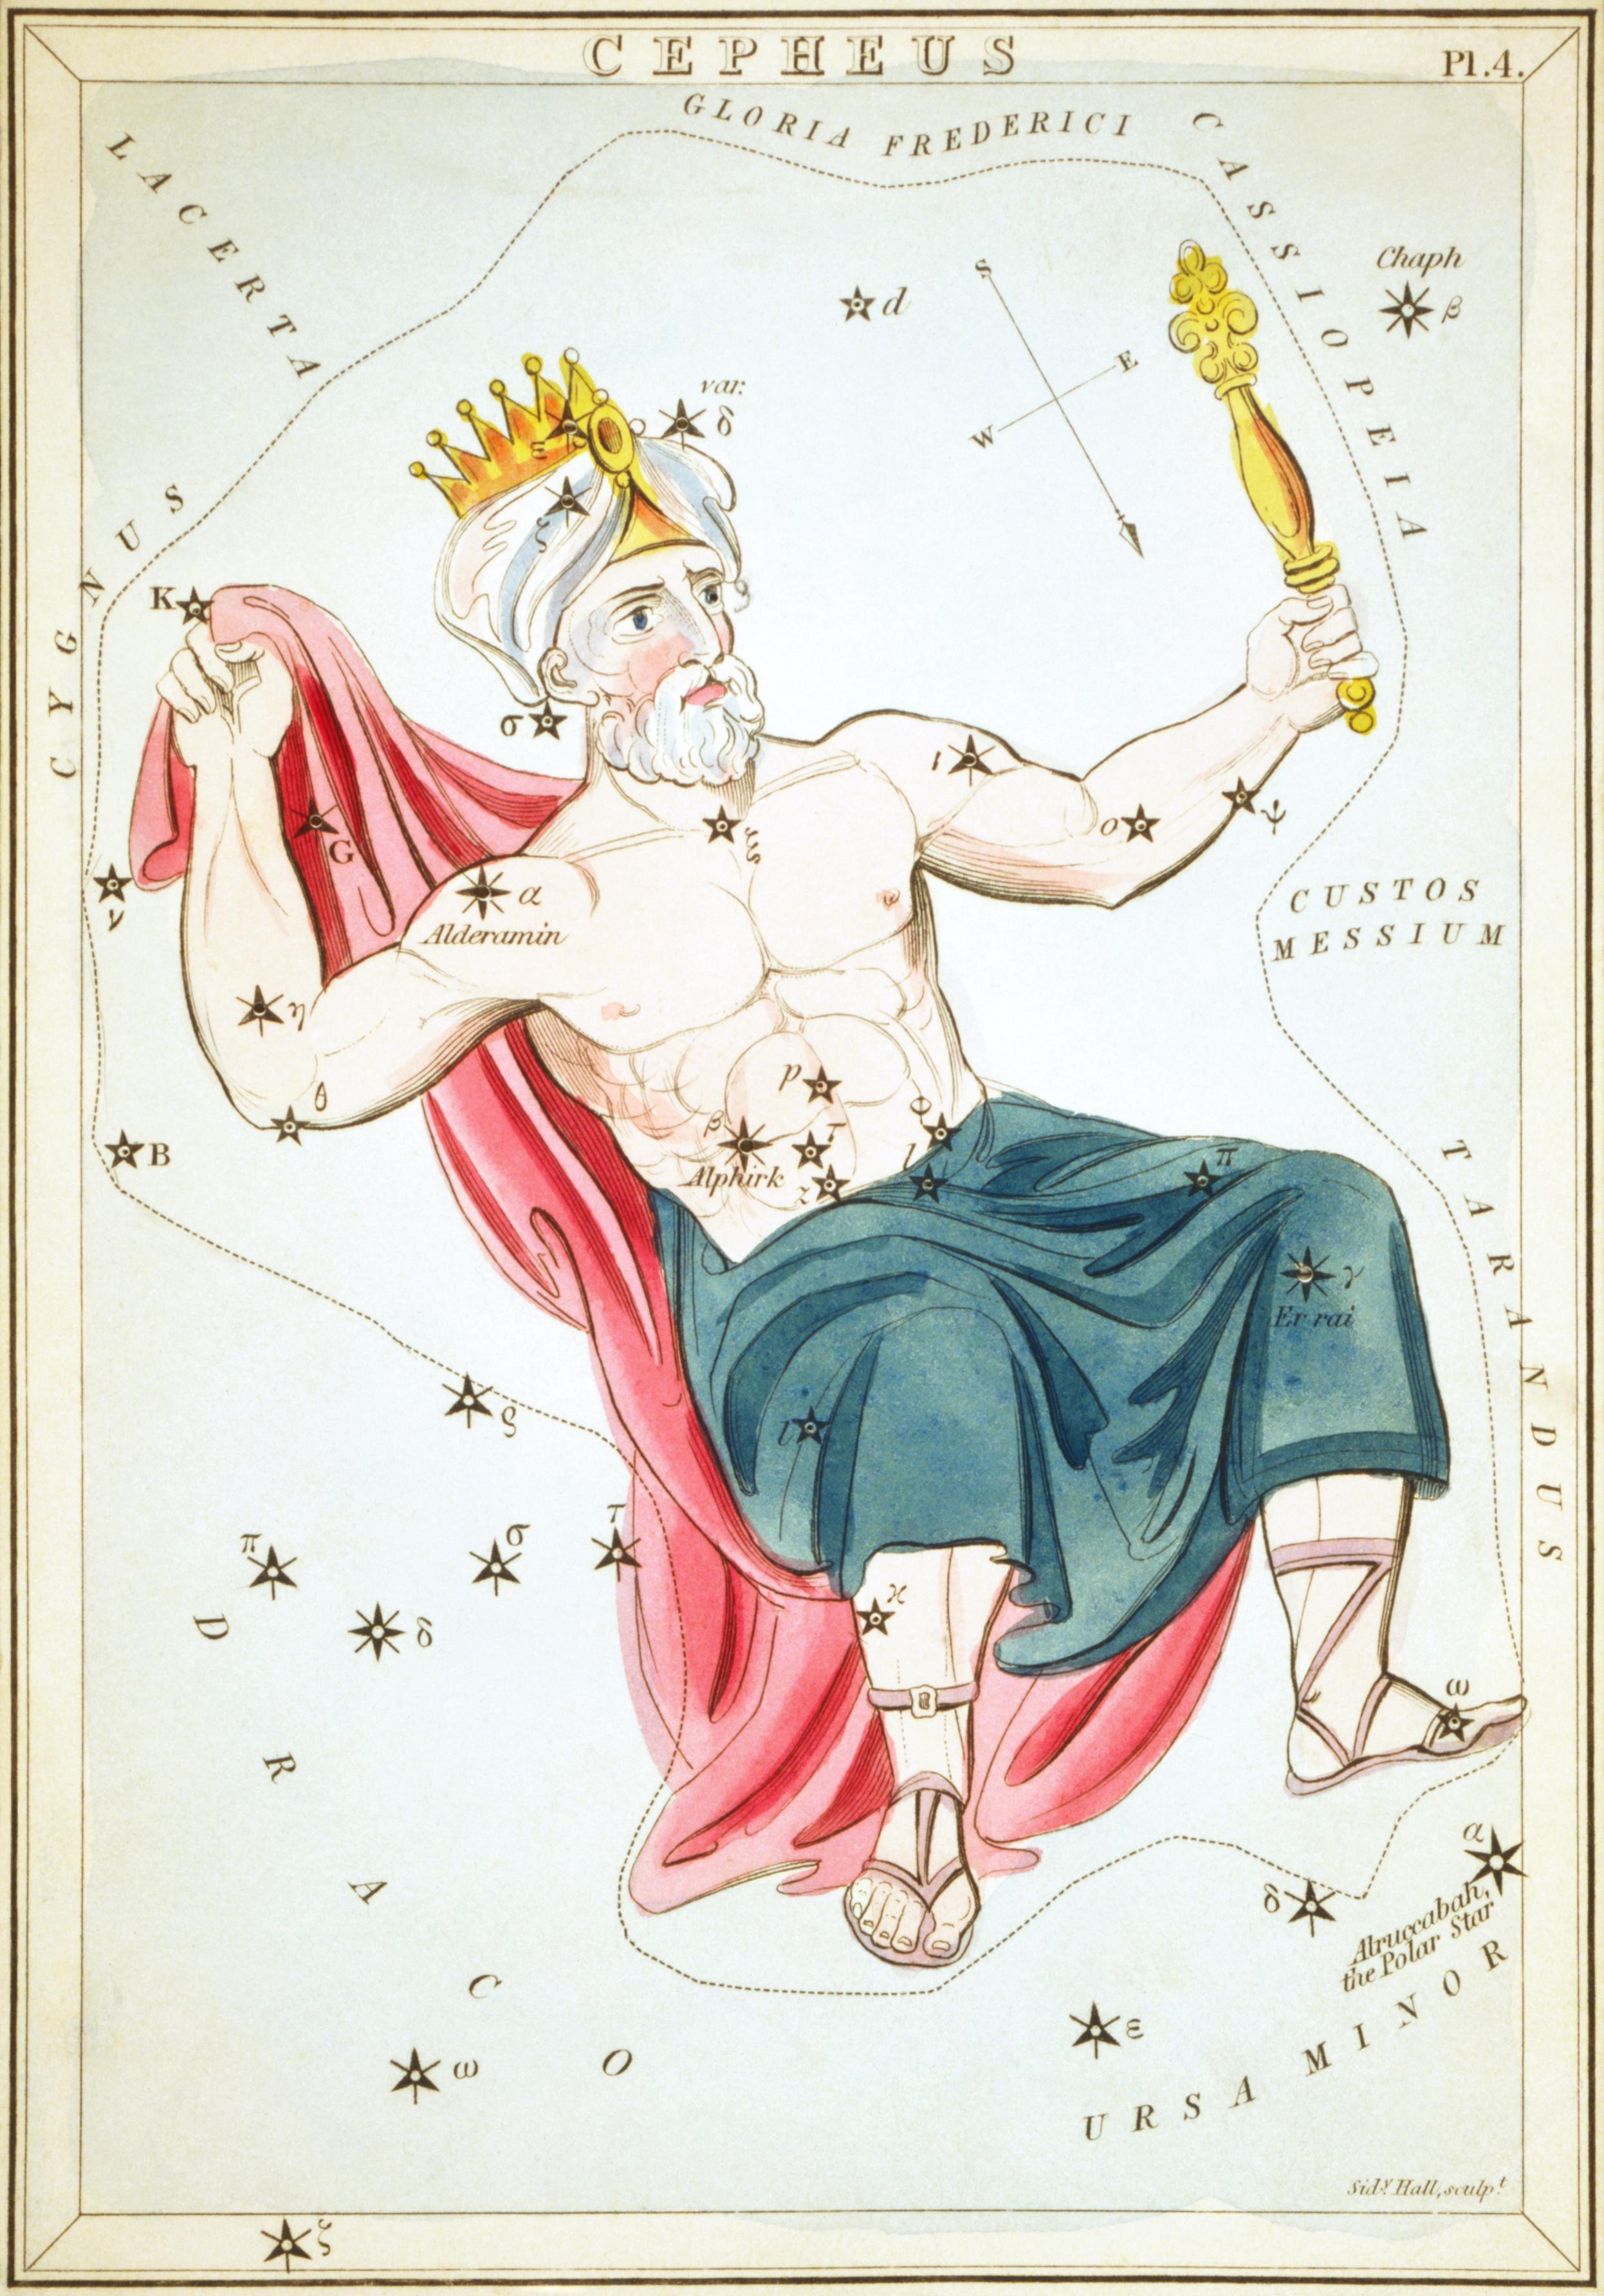 Chinese Zodiac Animals And Years Chart: Cepheus (constellation) - Wikipedia,Chart